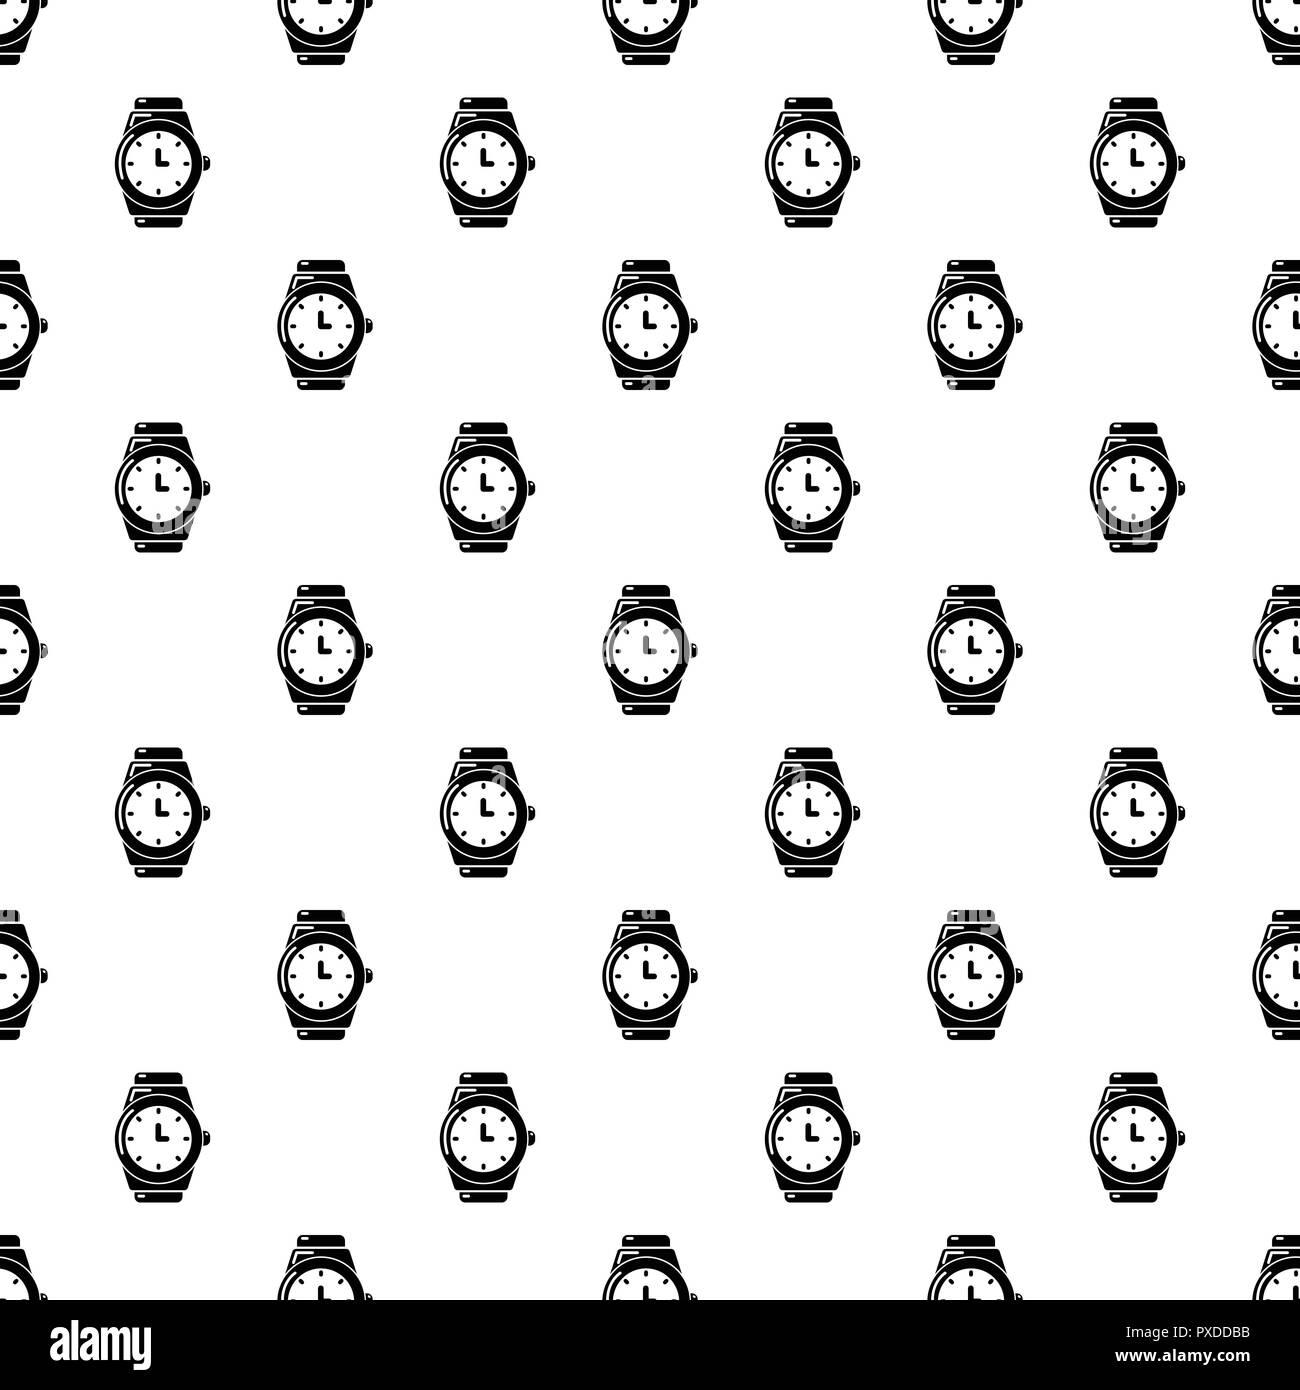 Wristwatch pattern vector seamless - Stock Image